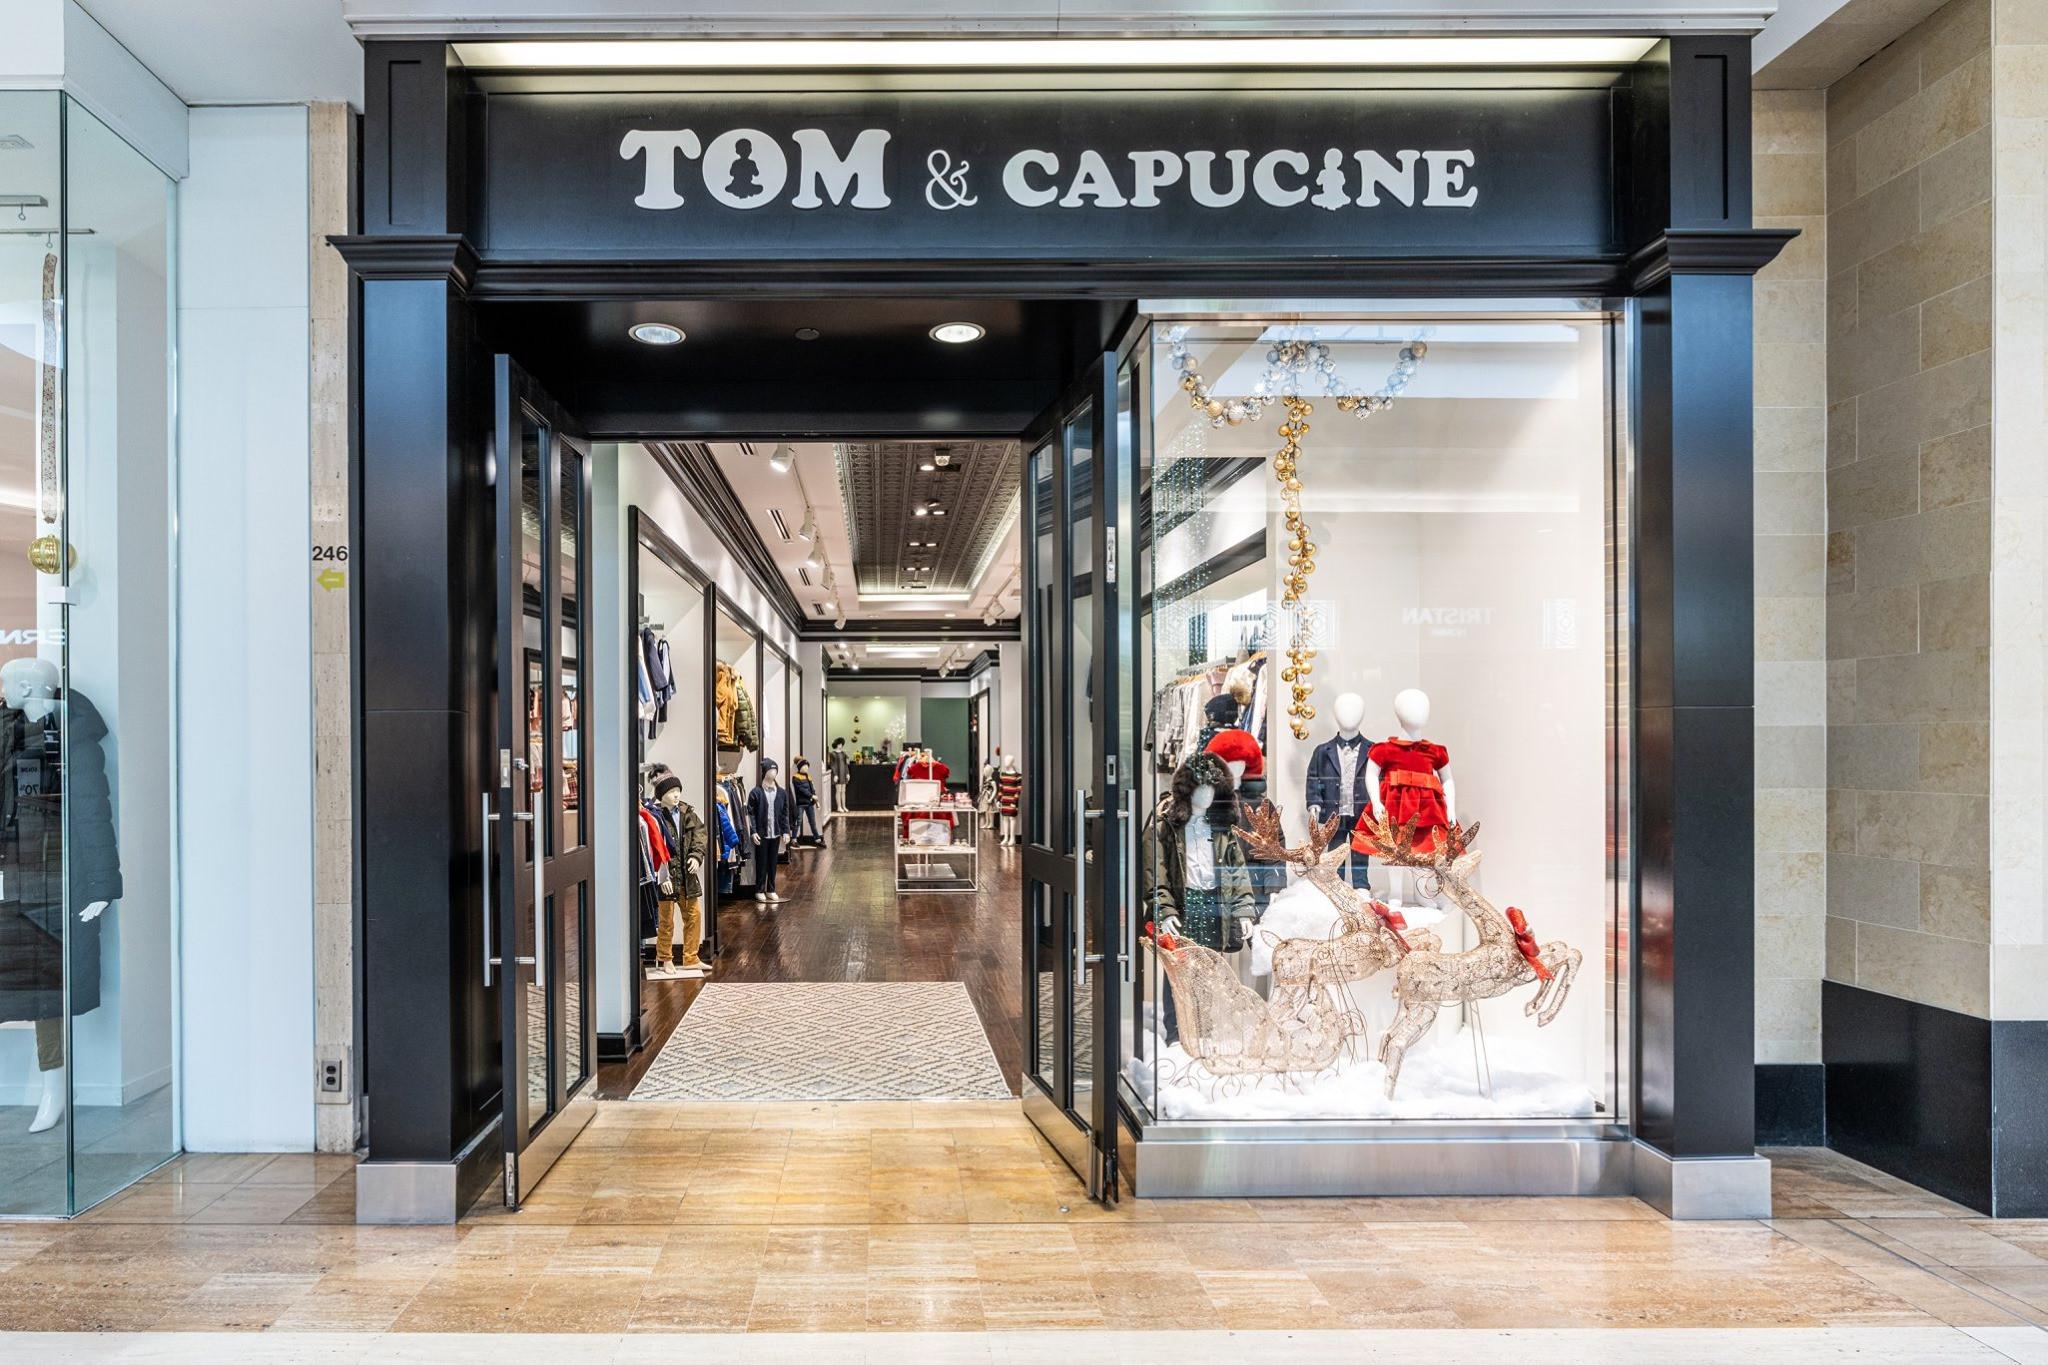 Tom & Capucine - Rockland